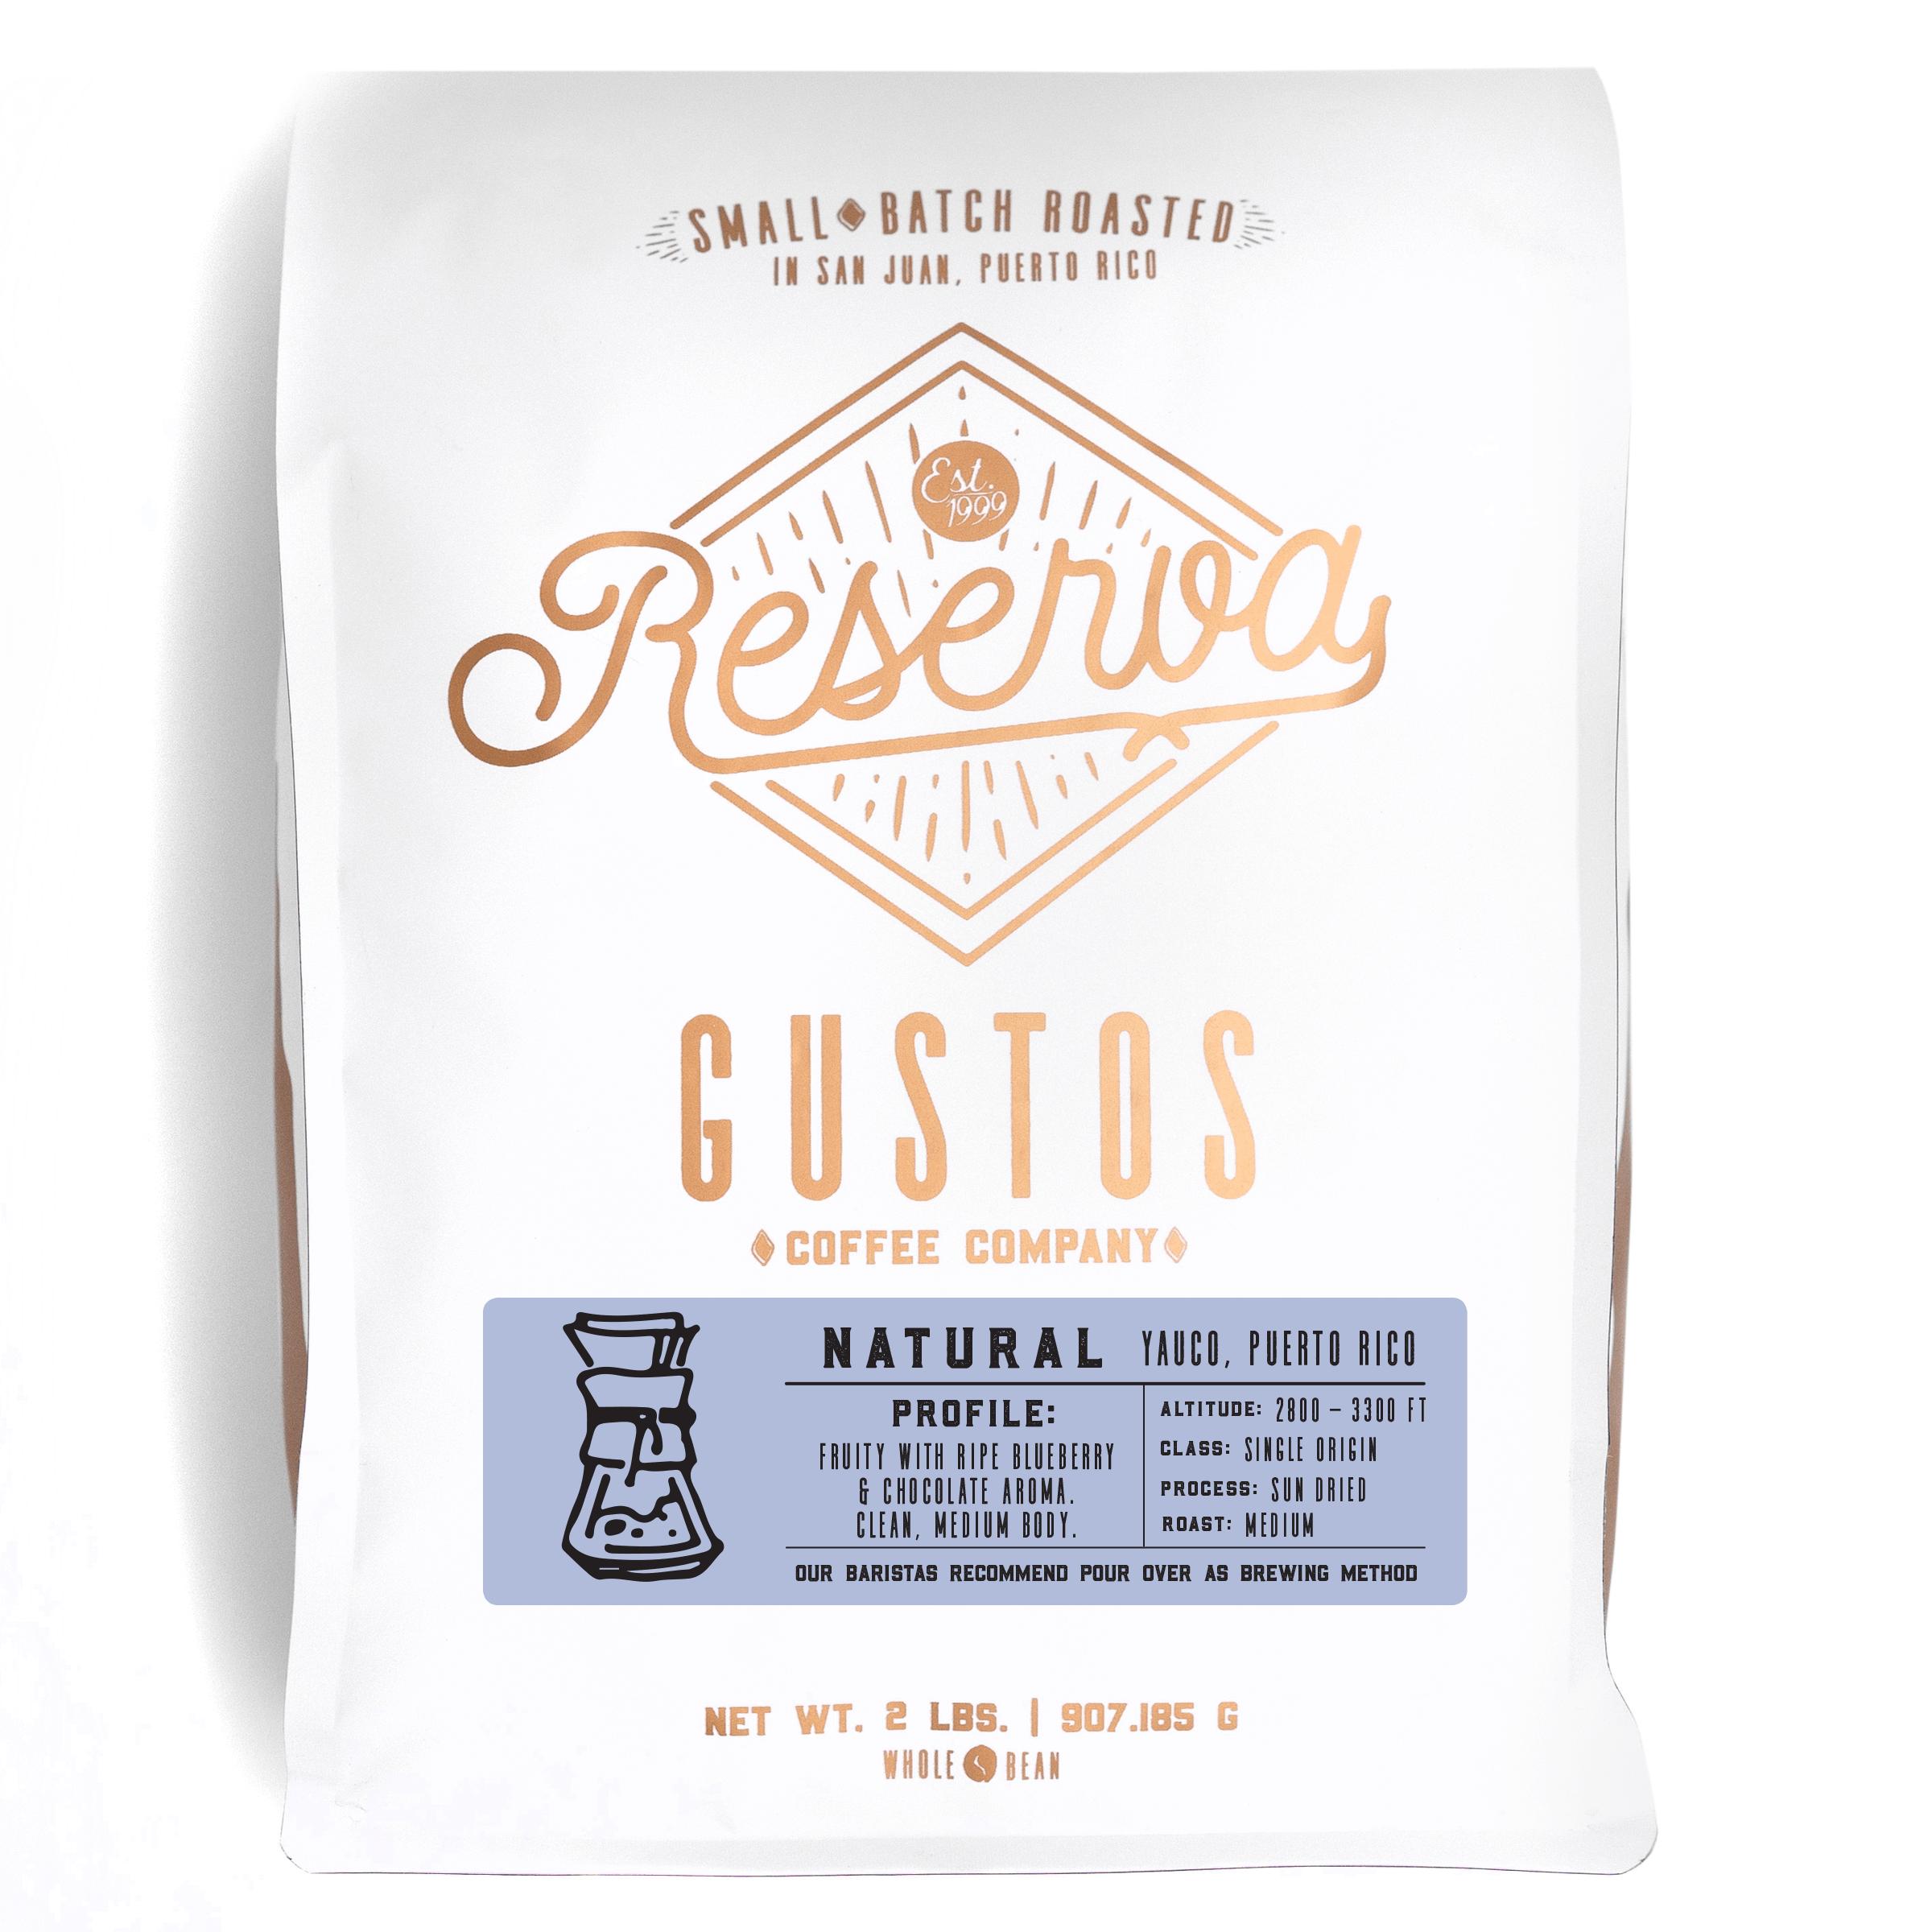 Gustos Reserva Specialty Coffee Single Origin Natural Yauco Puerto Rico 2 lbs Whole Bean Grano